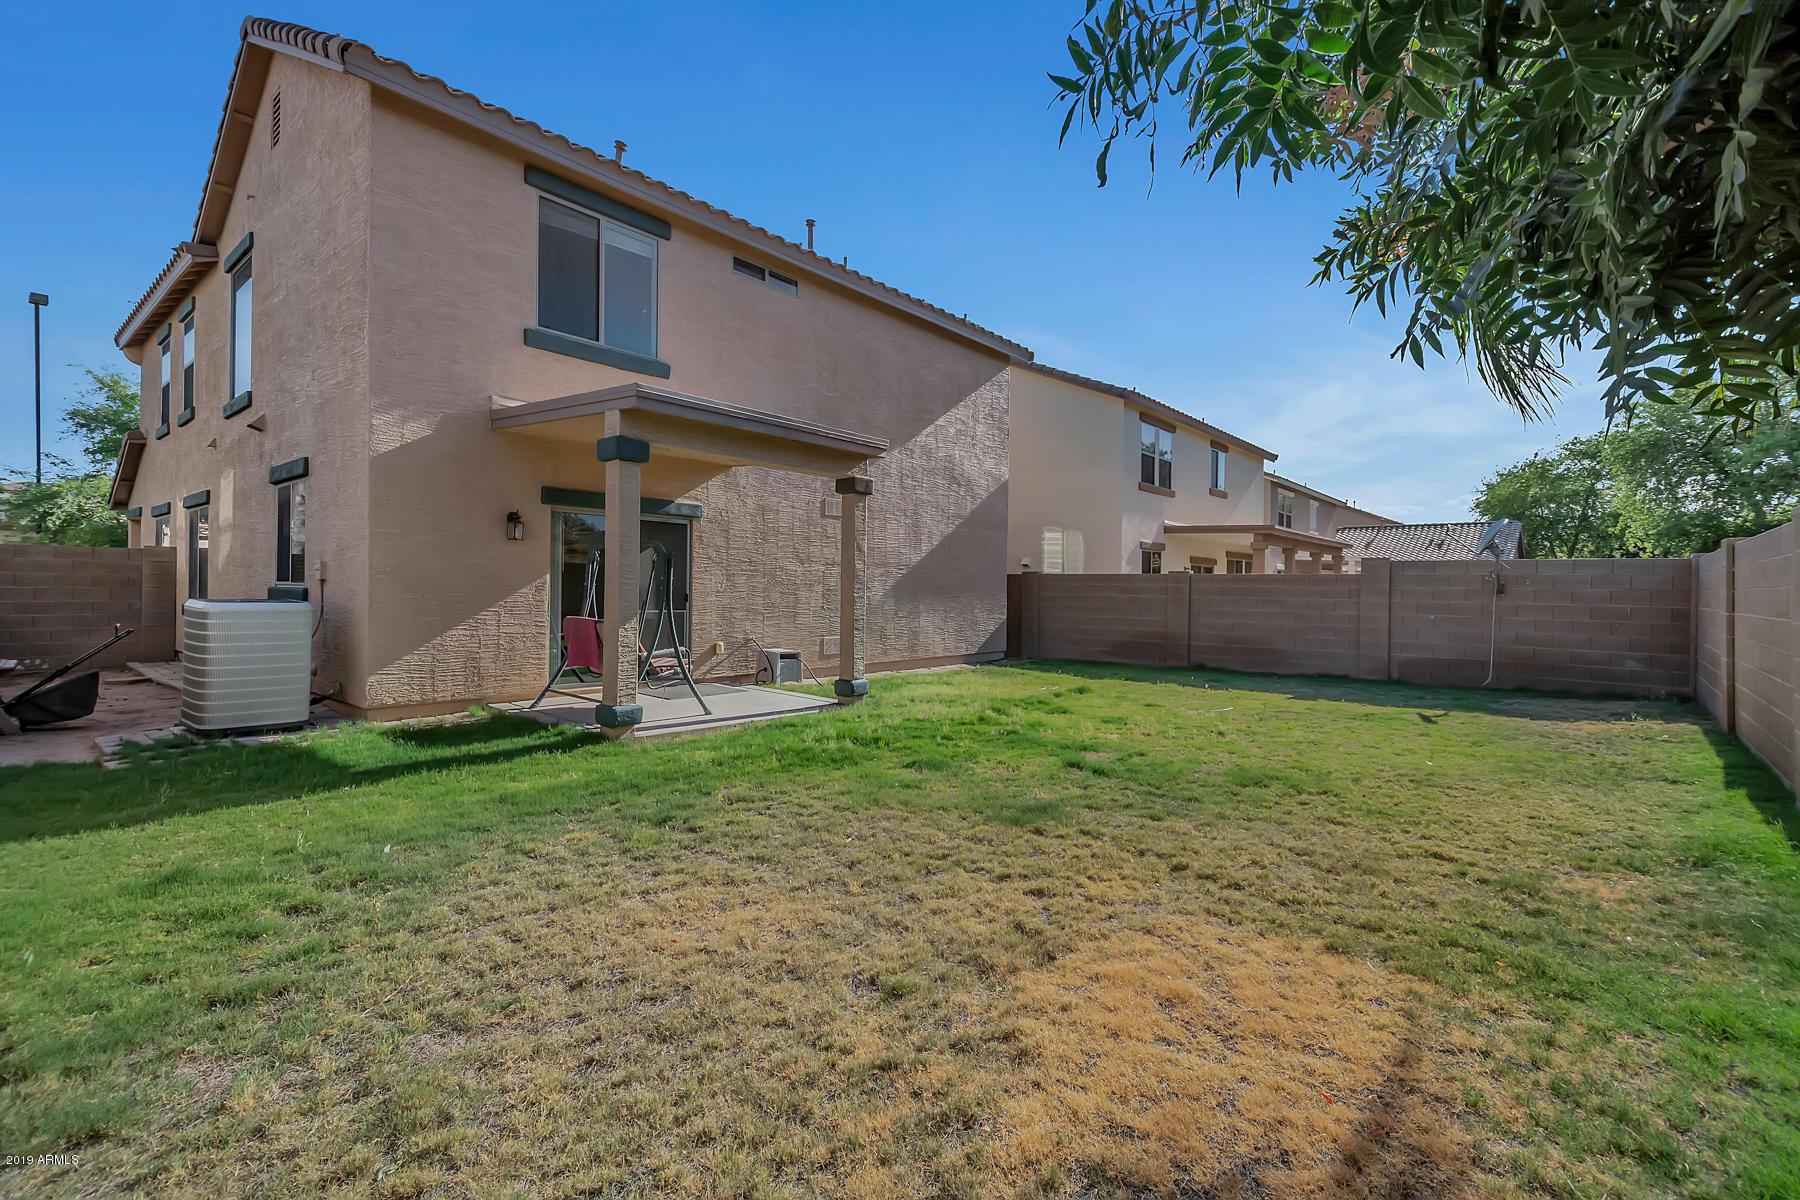 MLS 5928227 3020 E FRANKLIN Avenue, Gilbert, AZ 85295 Gilbert AZ Lyons Gate